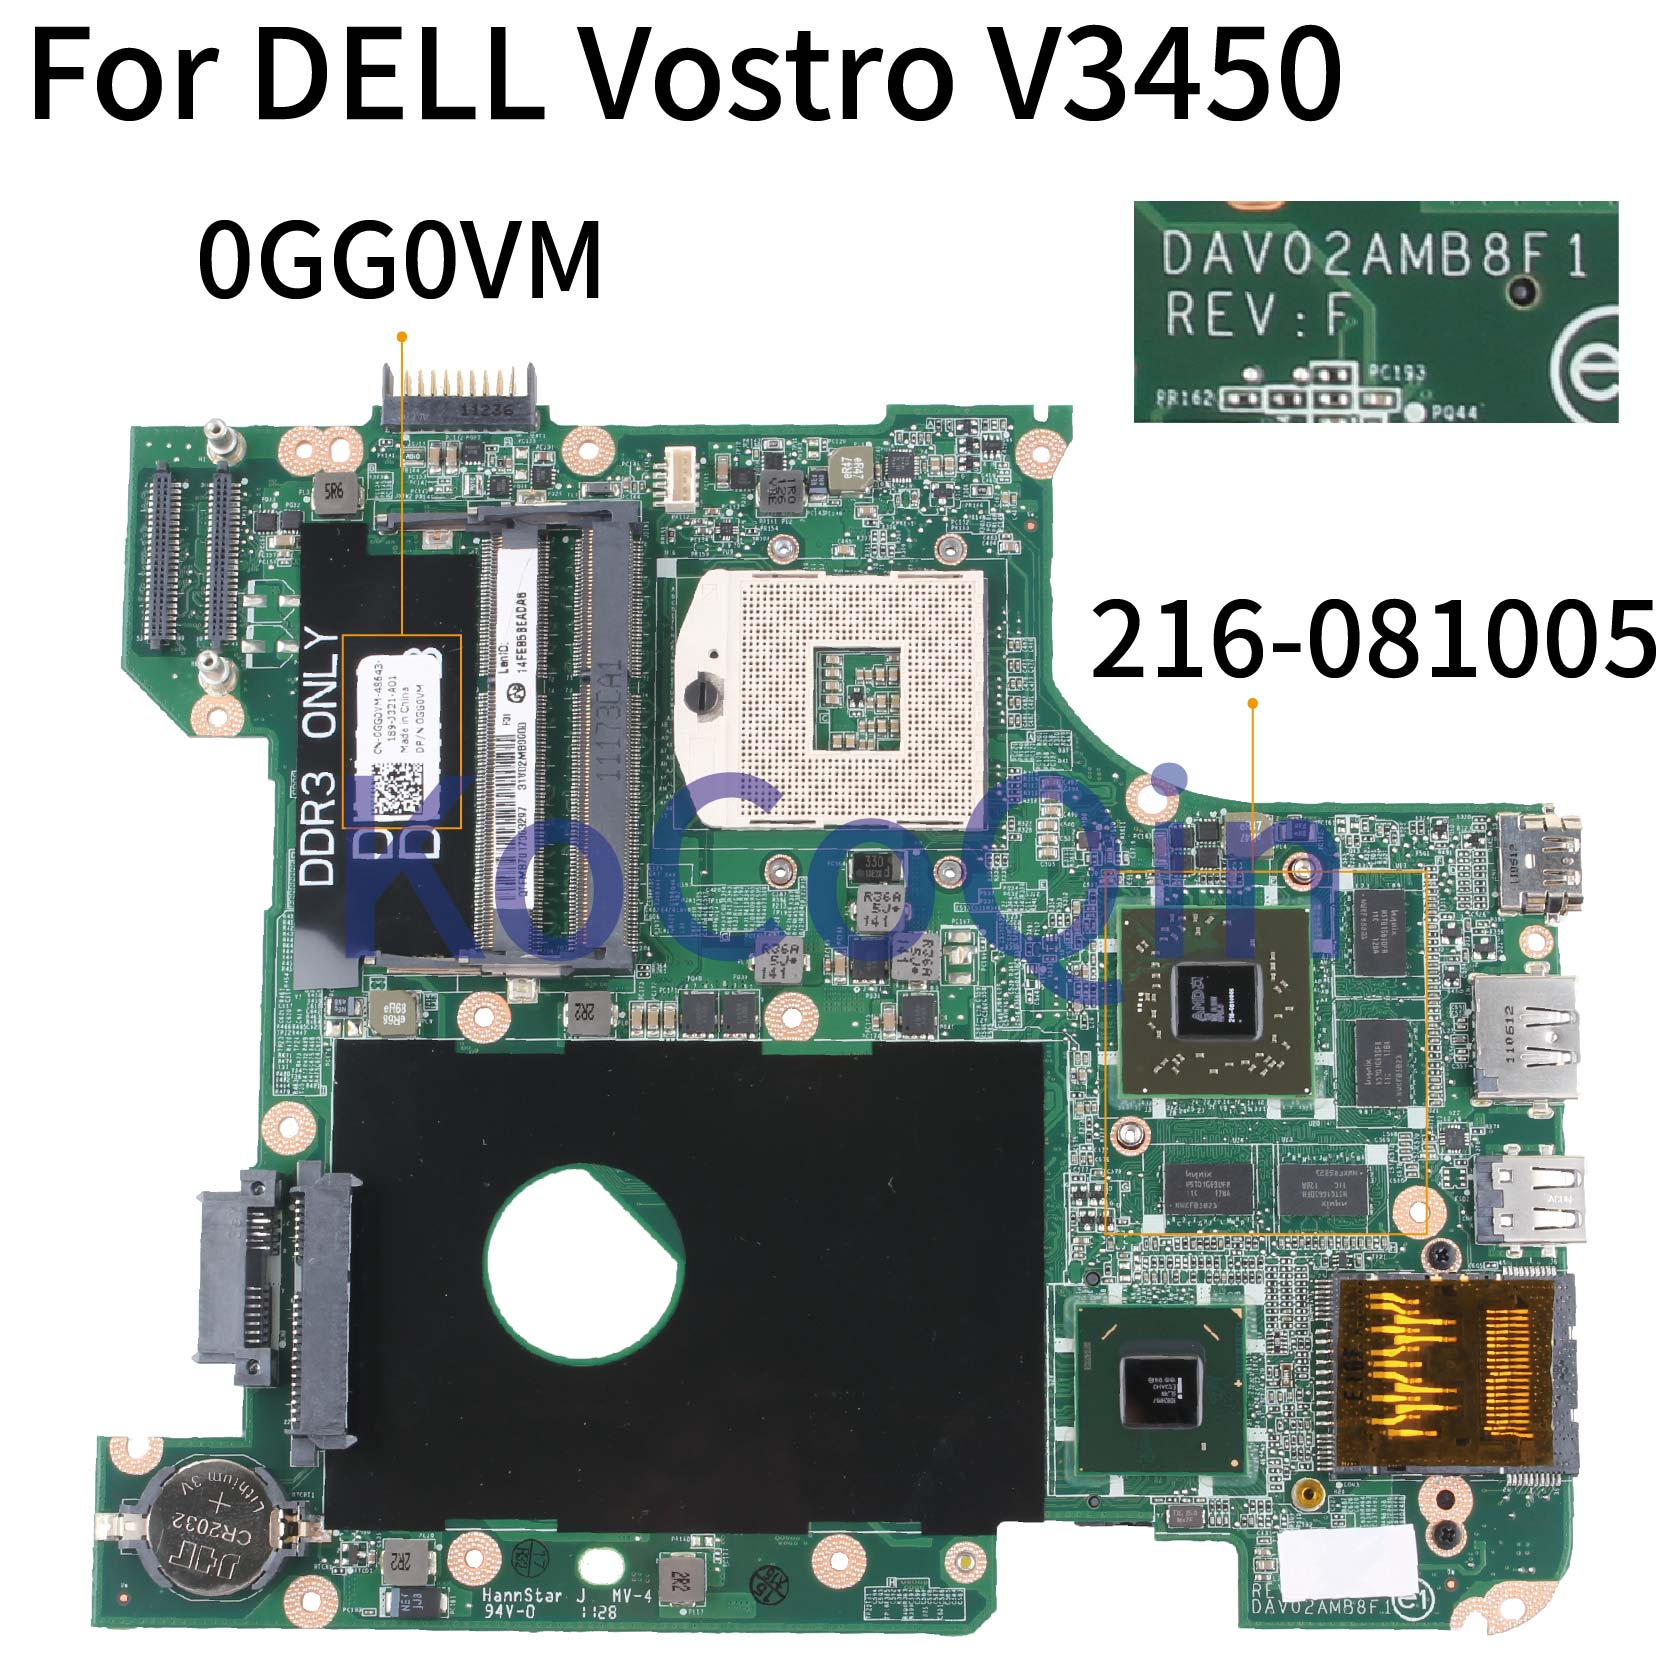 KoCoQin Laptop Motherboard For DELL Vostro 3450 V3450 HD6650M Mainboard CN-0GG0VM 0GG0VM DAV02AMB8F0 216-0810005 HM67